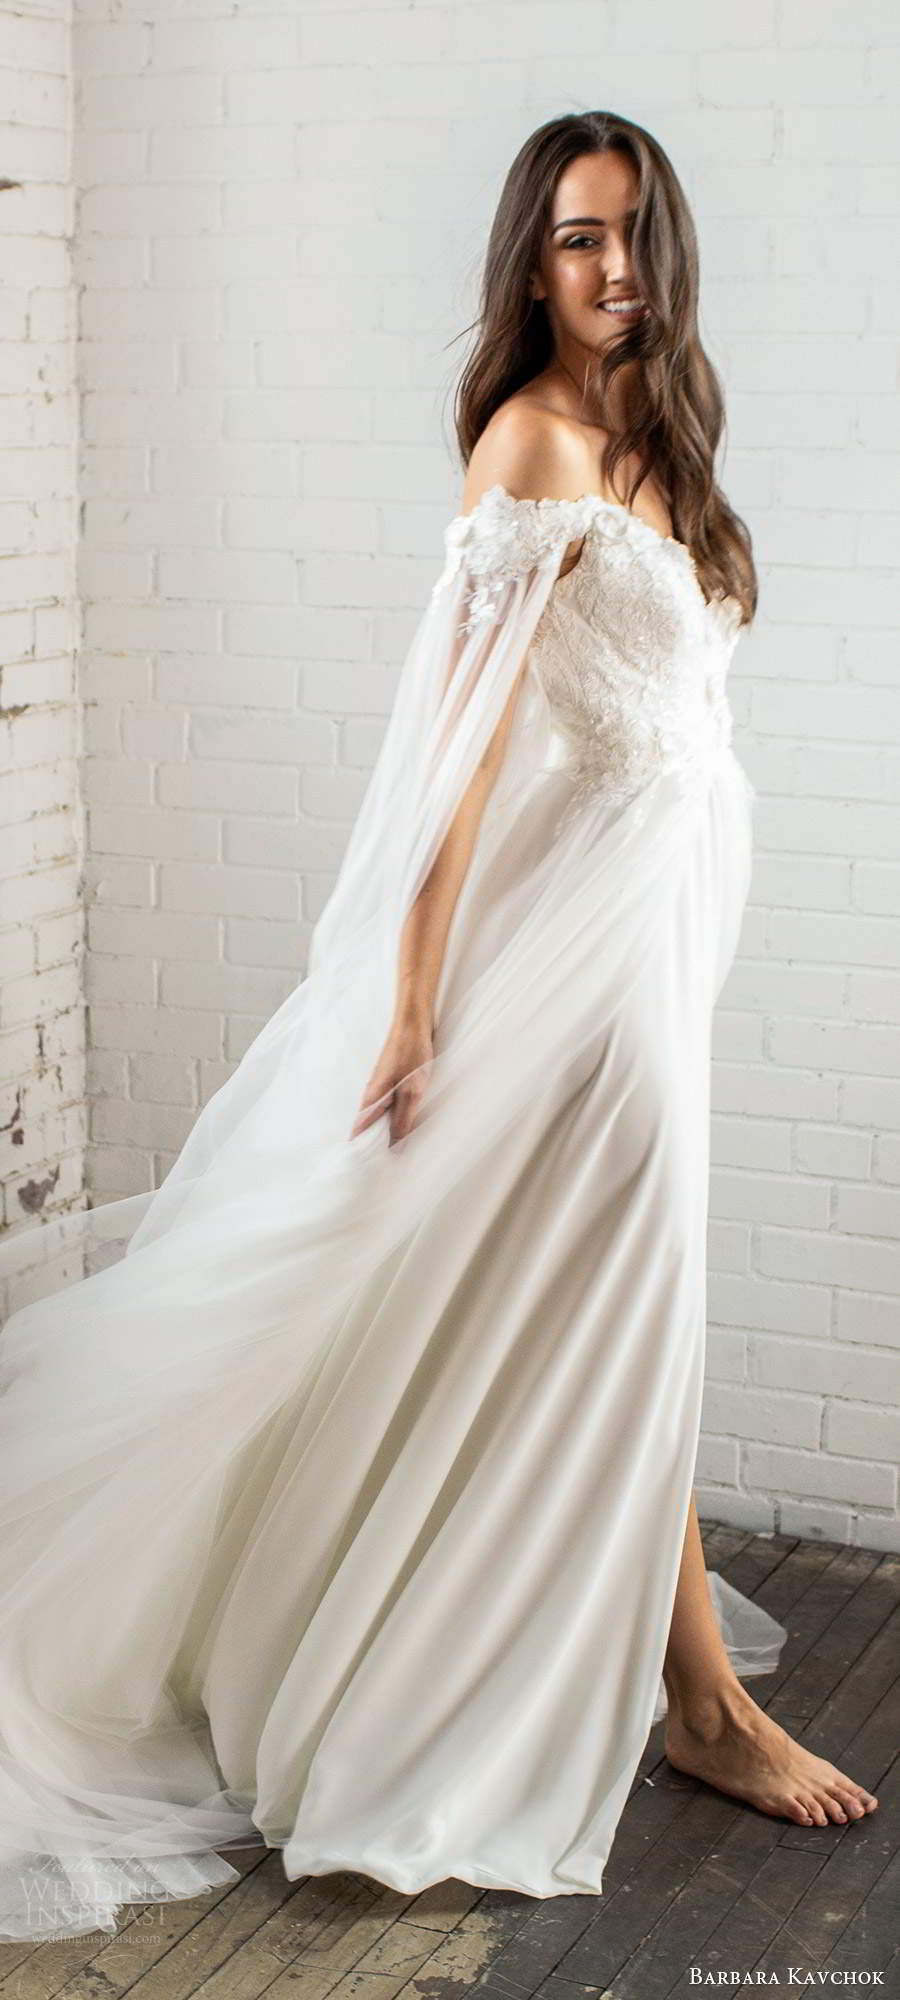 barbara kavchok fall 2020 bridal off shoulder long split sleeves sweetheart neckline embellished bodice slit skirt a line ball gown wedding dress chapel train (5) sv